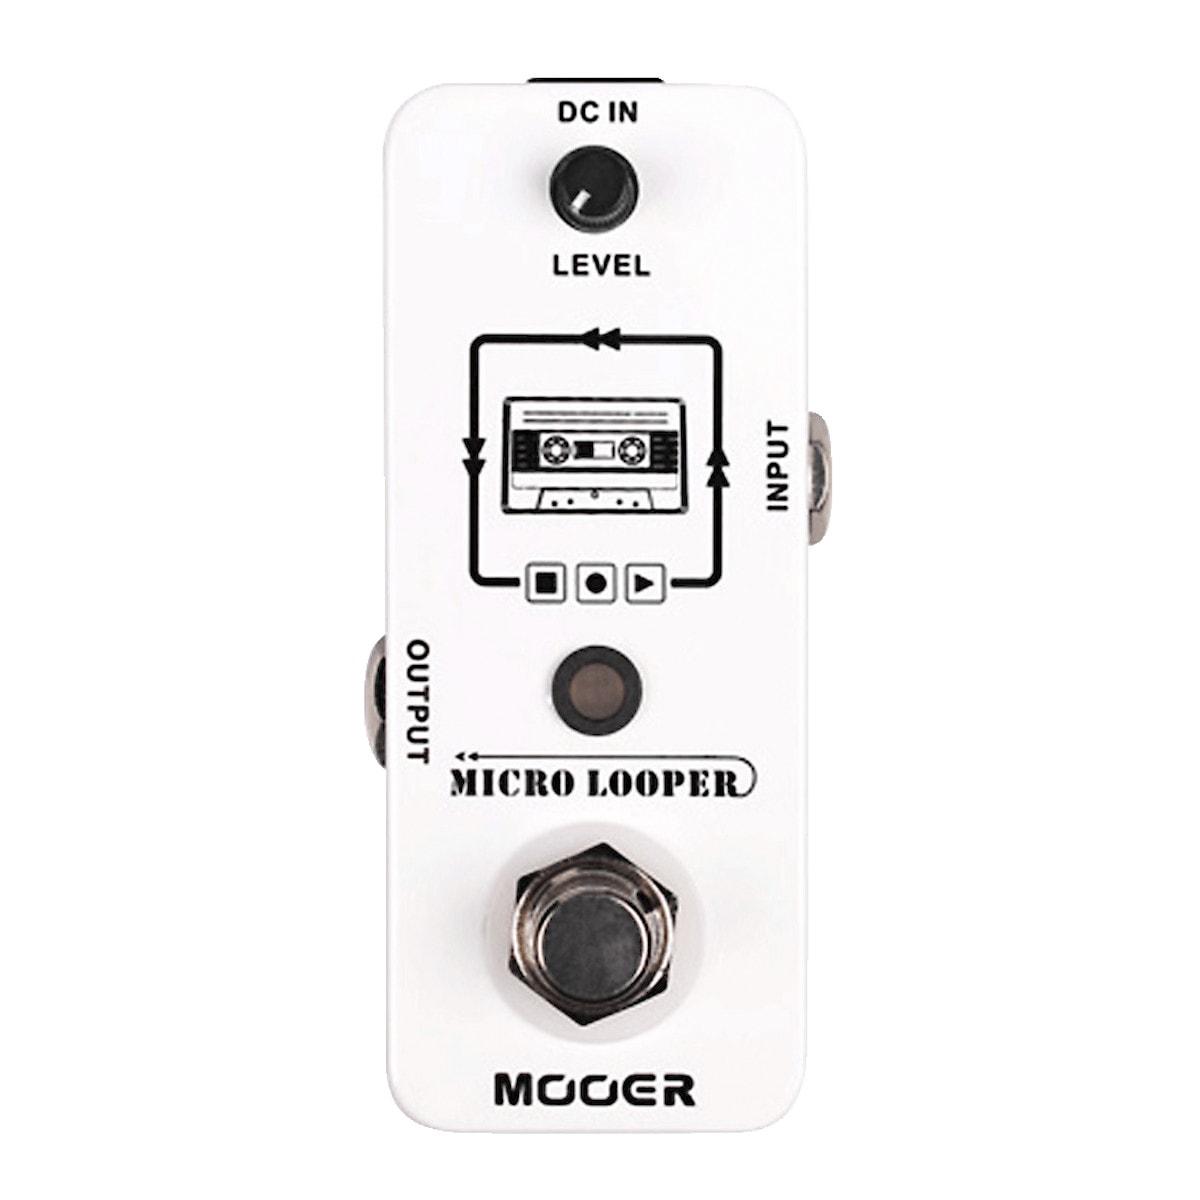 Pedal Mooer Micro Looper